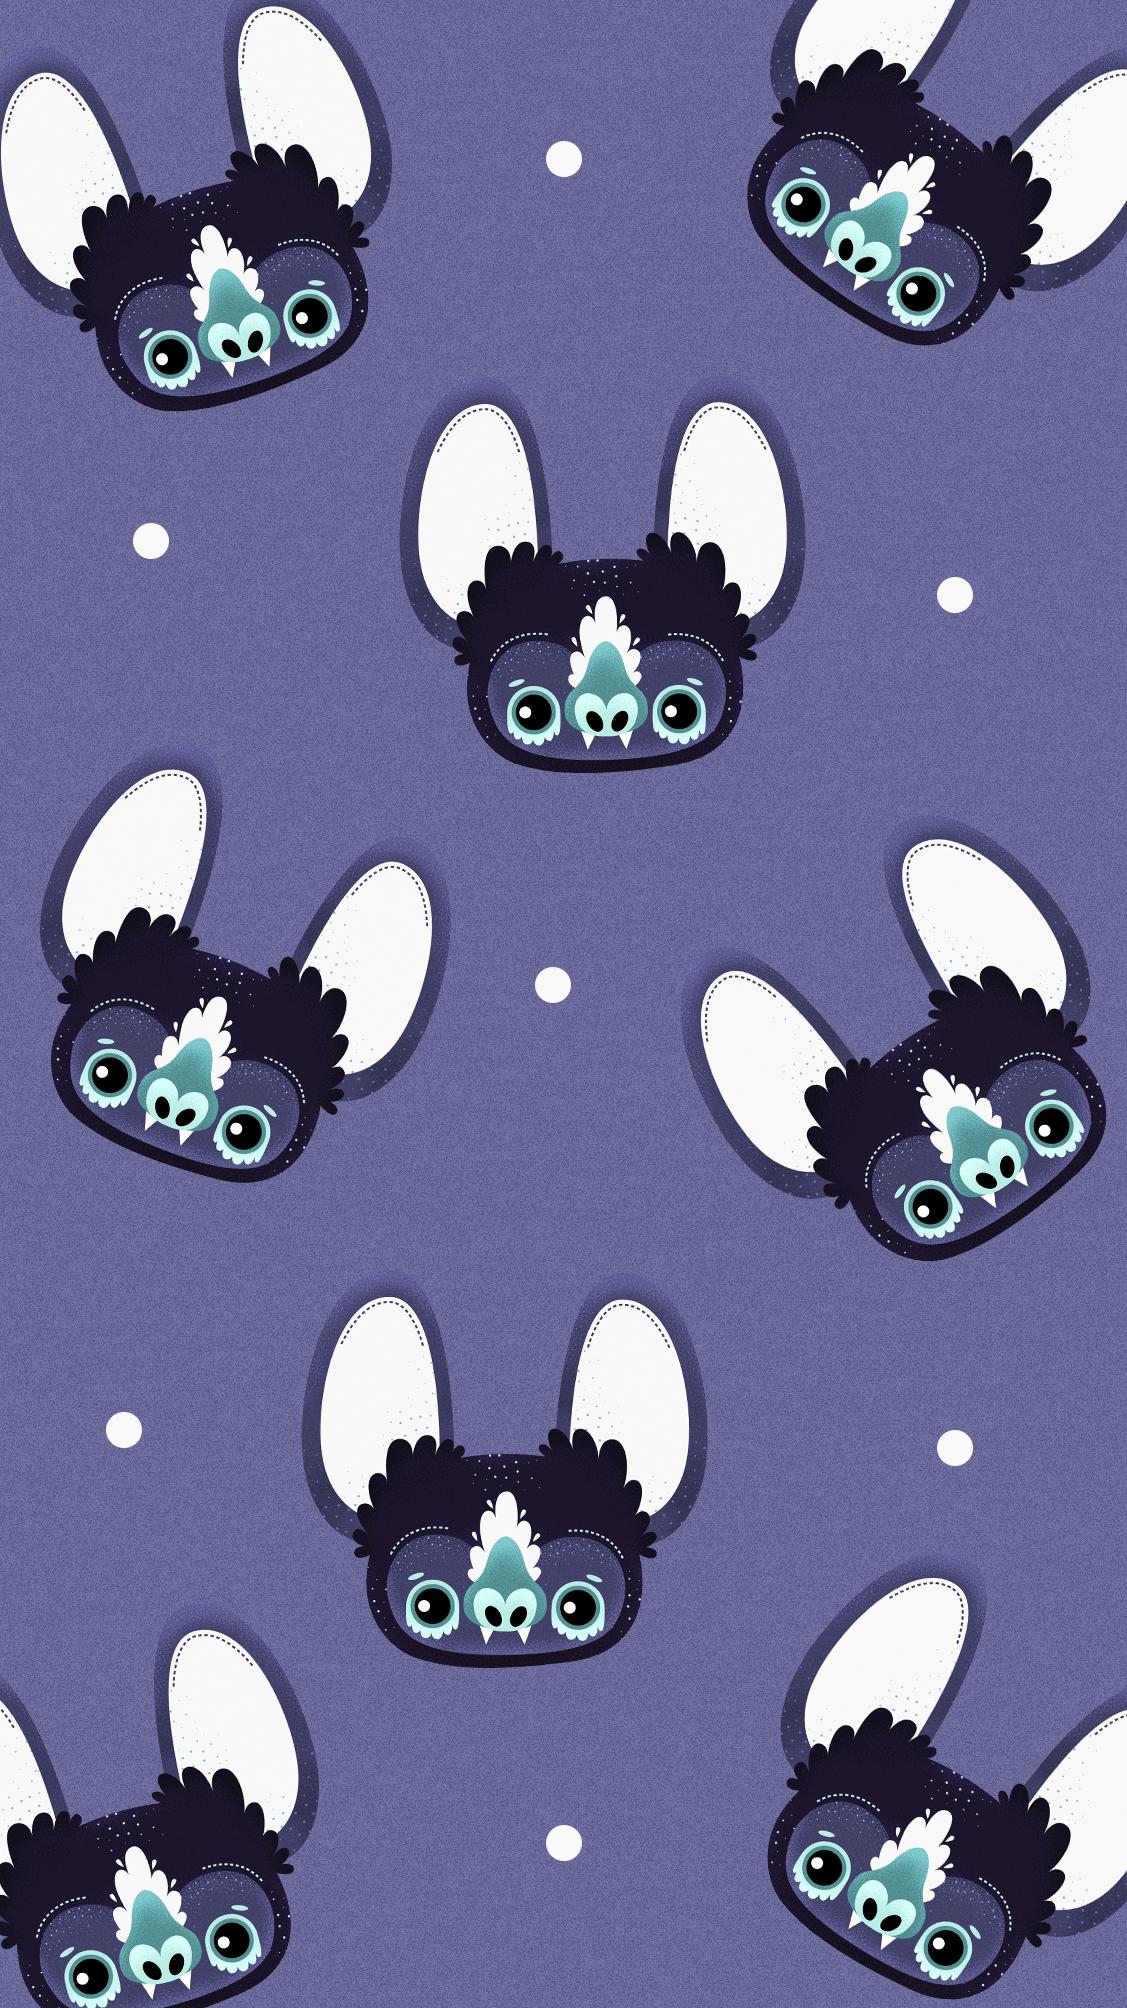 Diana Garoli Illustration Bat Wallpaper Witchy Wallpaper Cute Bat Cute Wallpapers